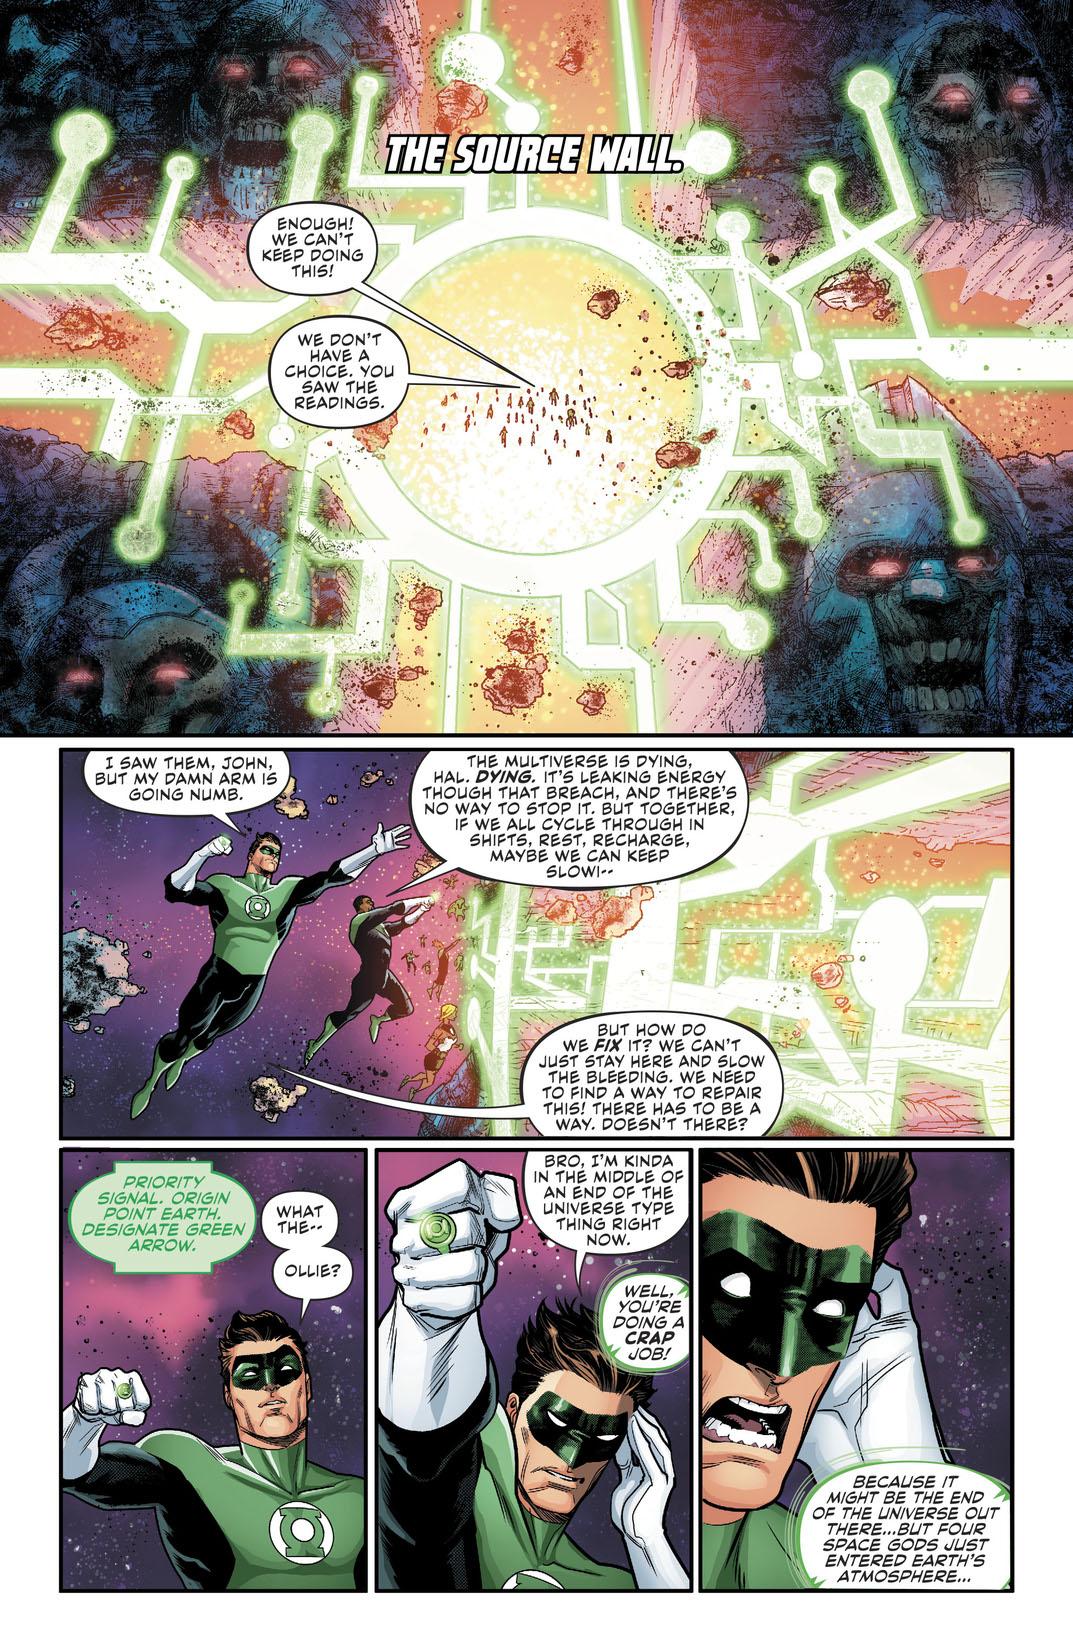 Read Justice League: No Justice (2018-) #4 on DC Universe